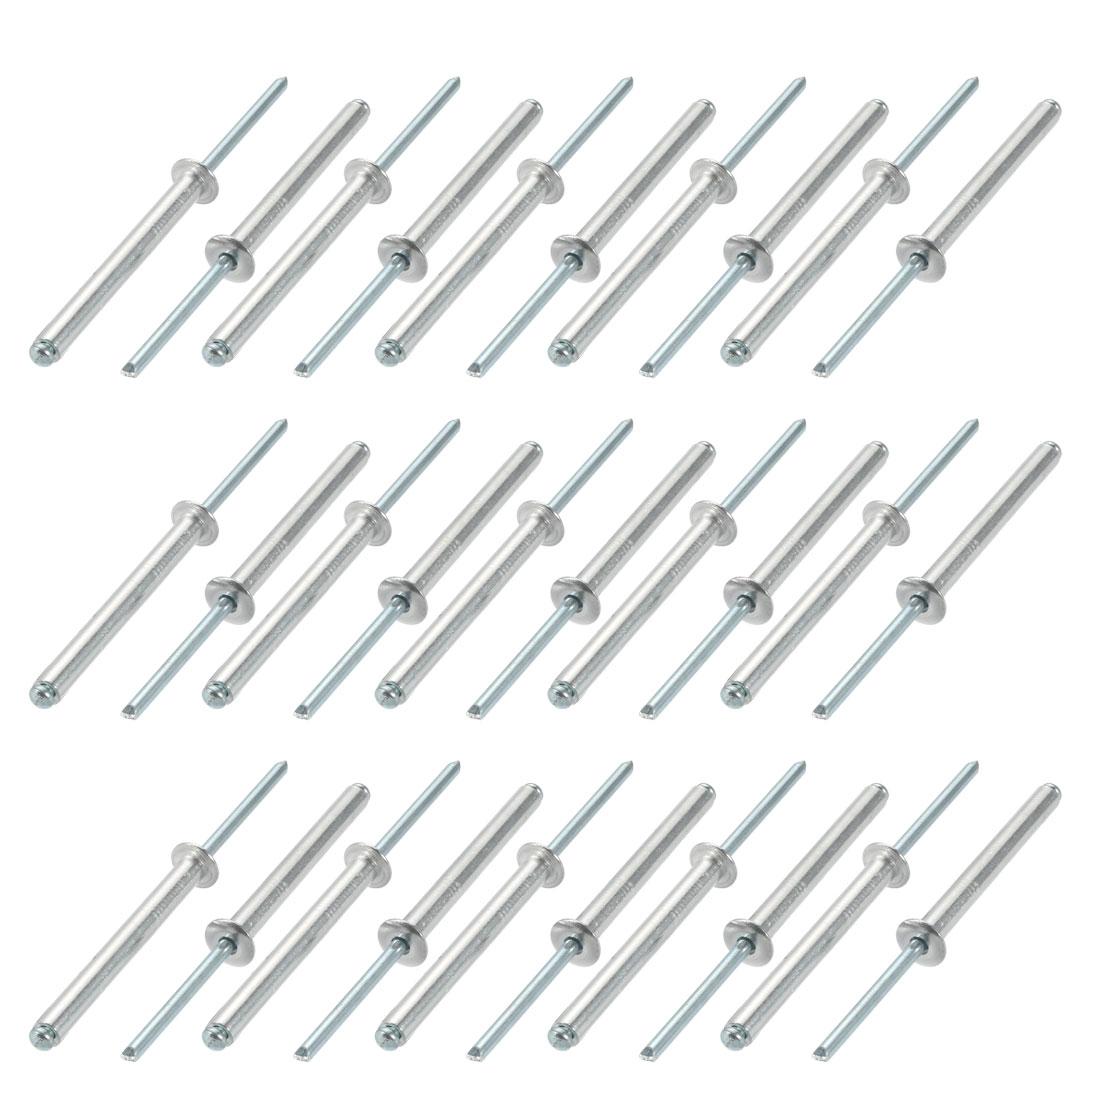 30 Pcs 5mm x 45mm Aluminum/Steel Open End Blind Rivets